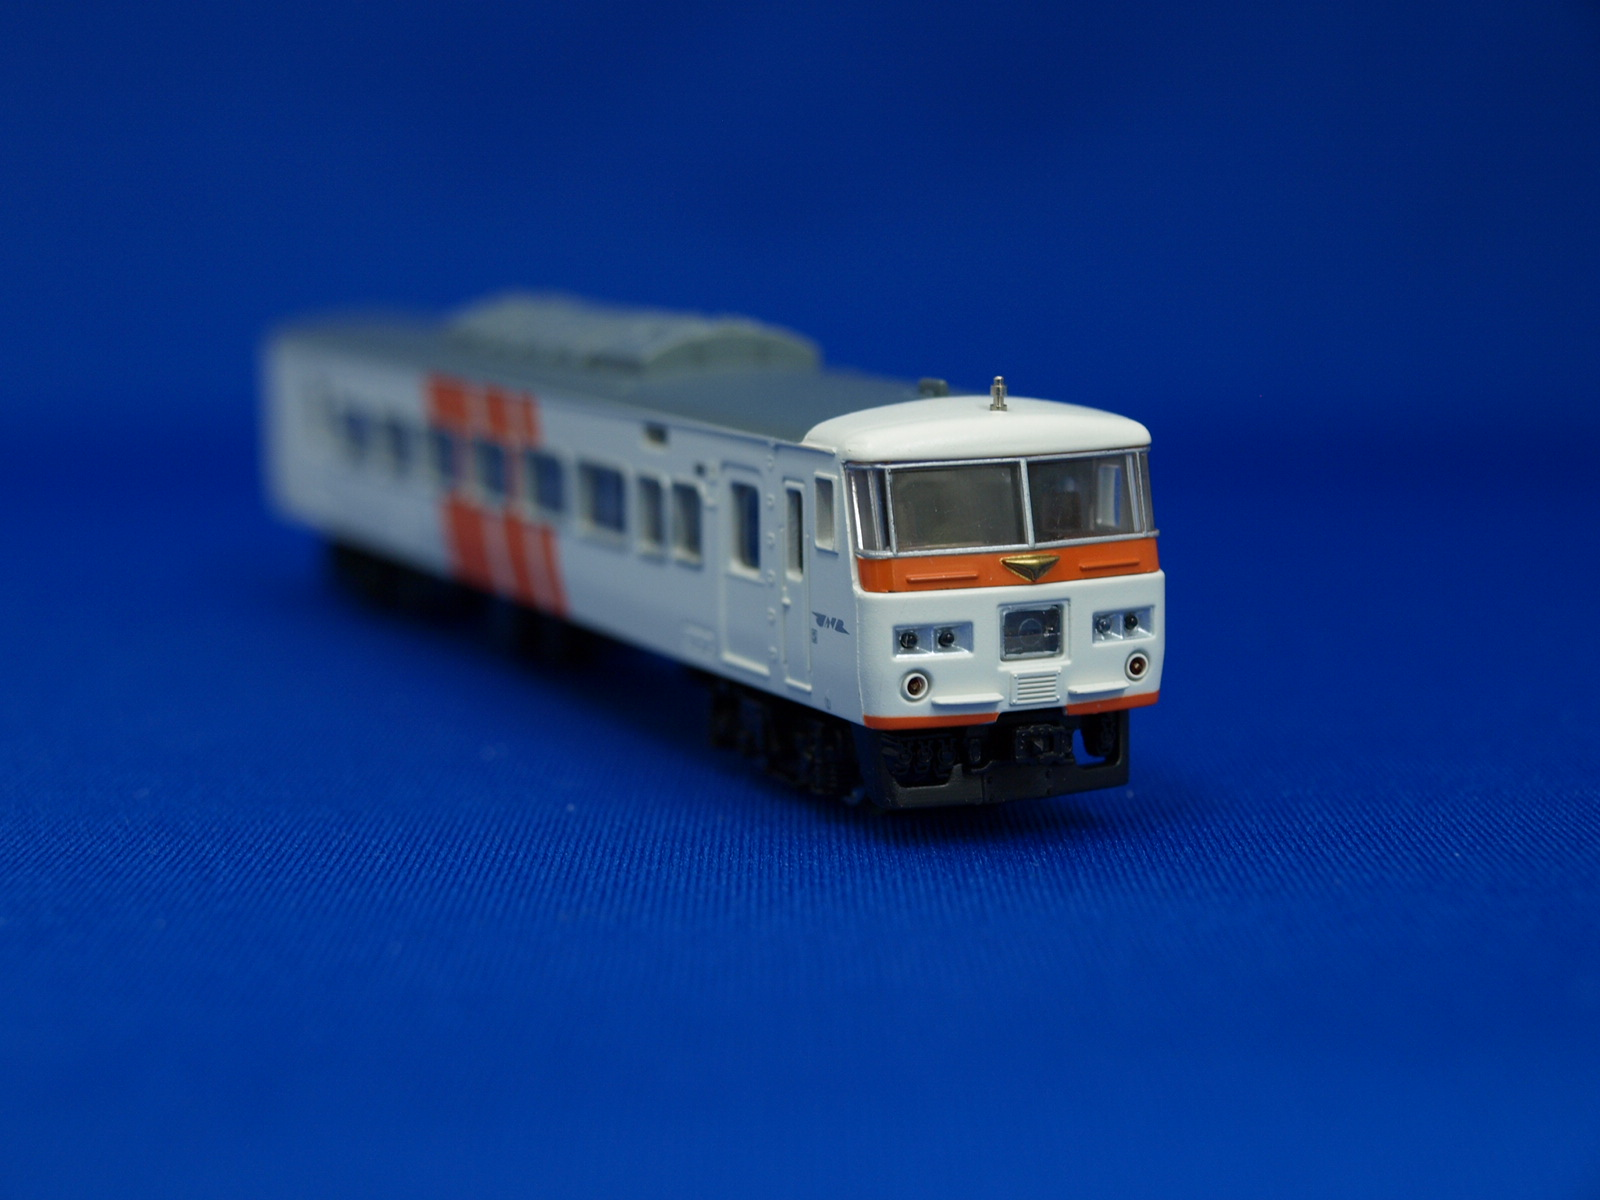 Nゲージ マイクロエース A4160  国鉄185系 試案塗装・朱編成 7両セット 【限定品】